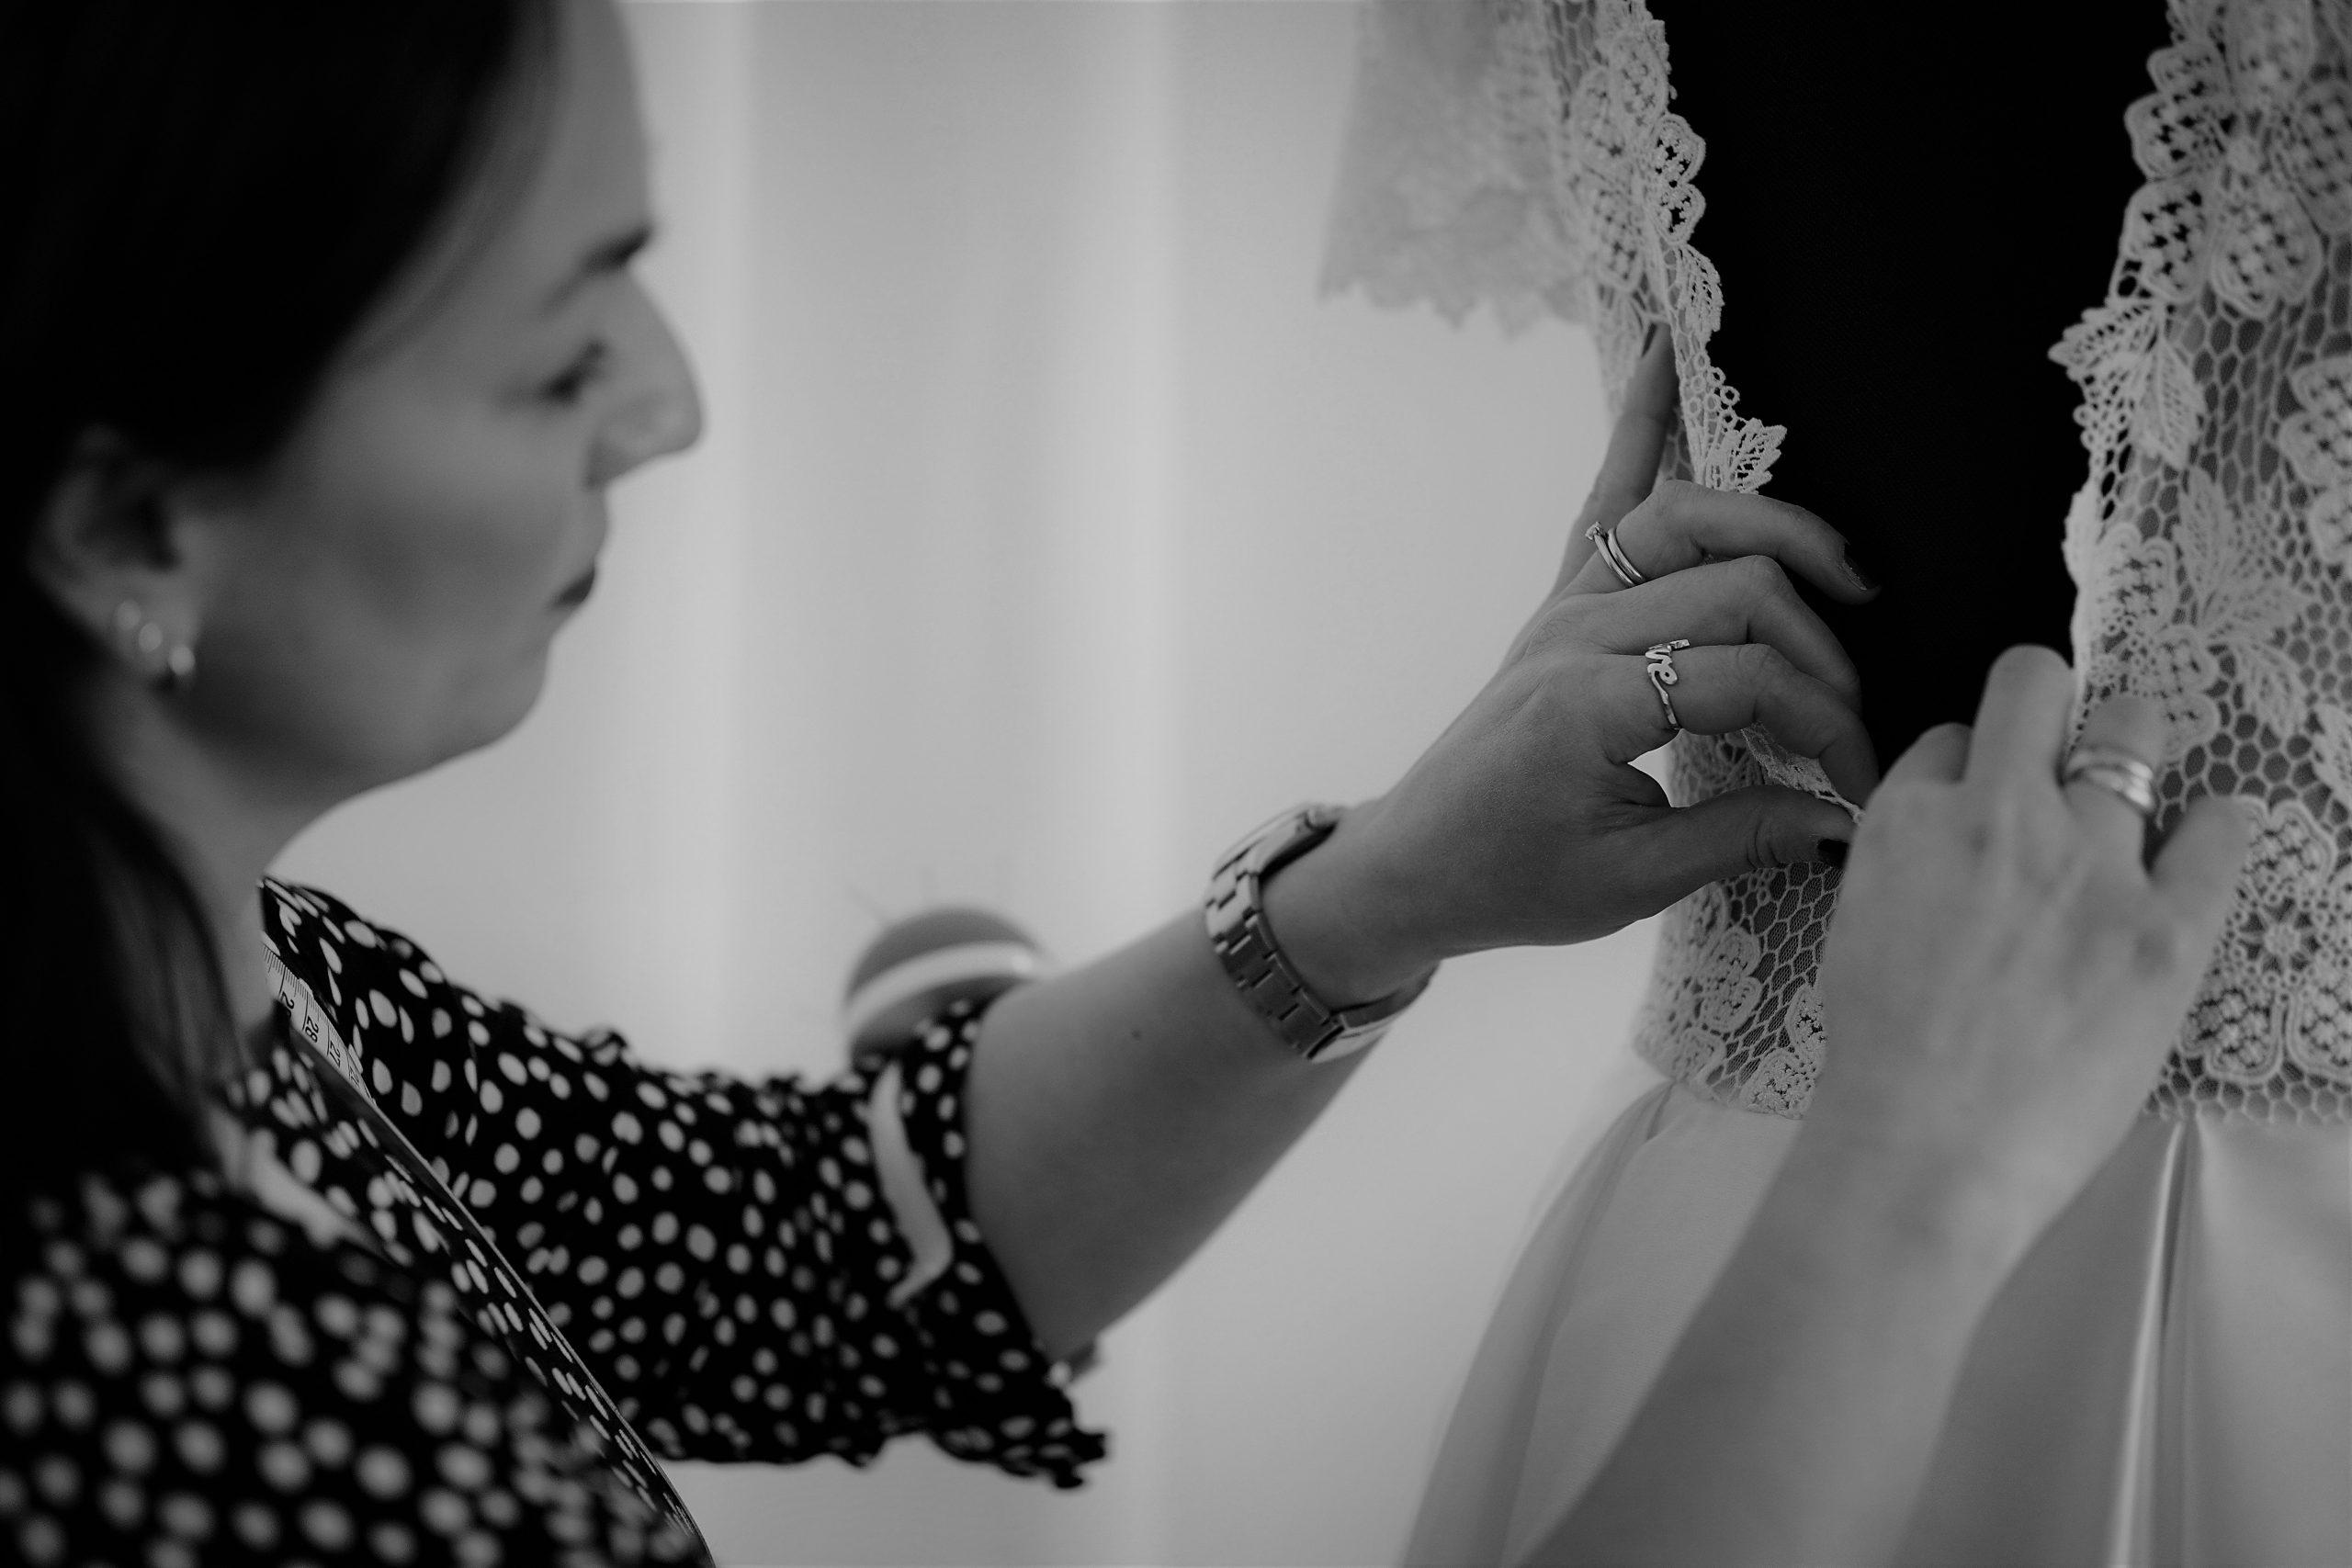 Simone im Atelier hugs & kisses